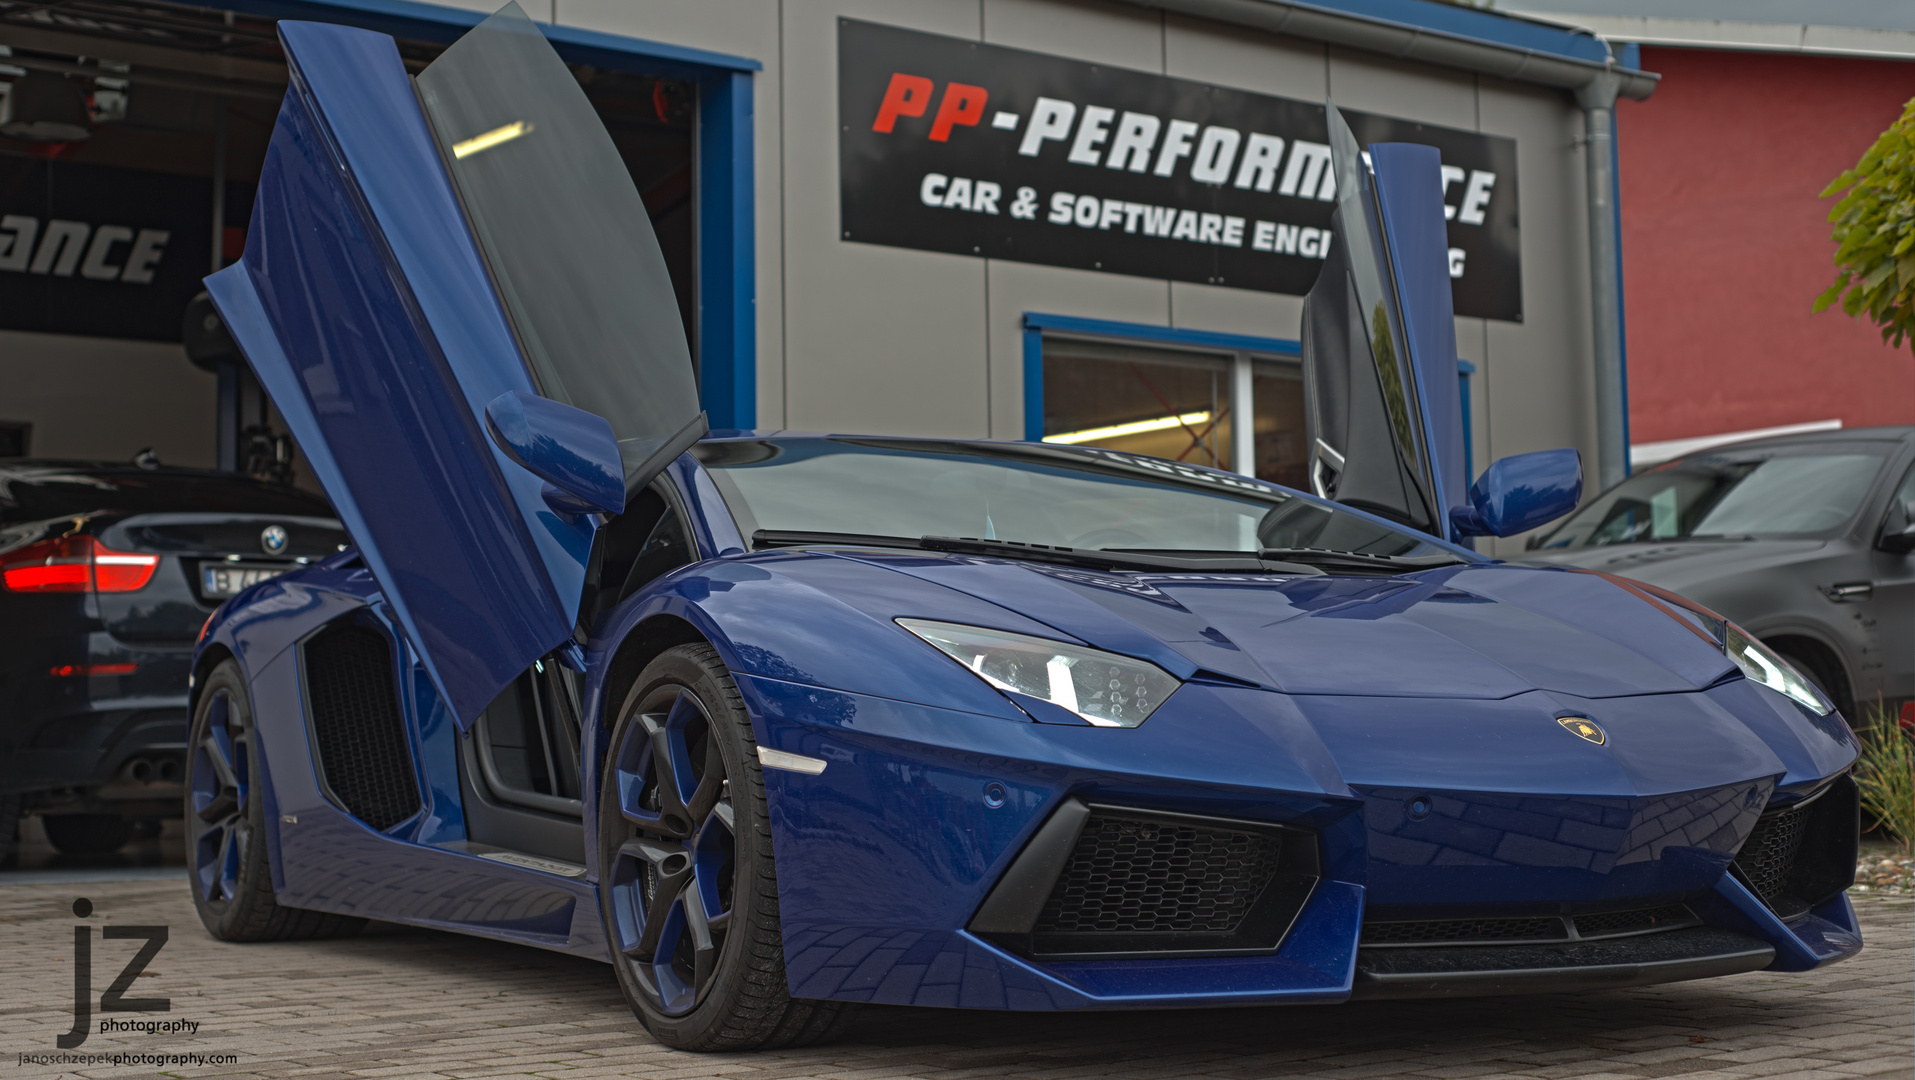 Lamborghini Aventador by PP-Performance